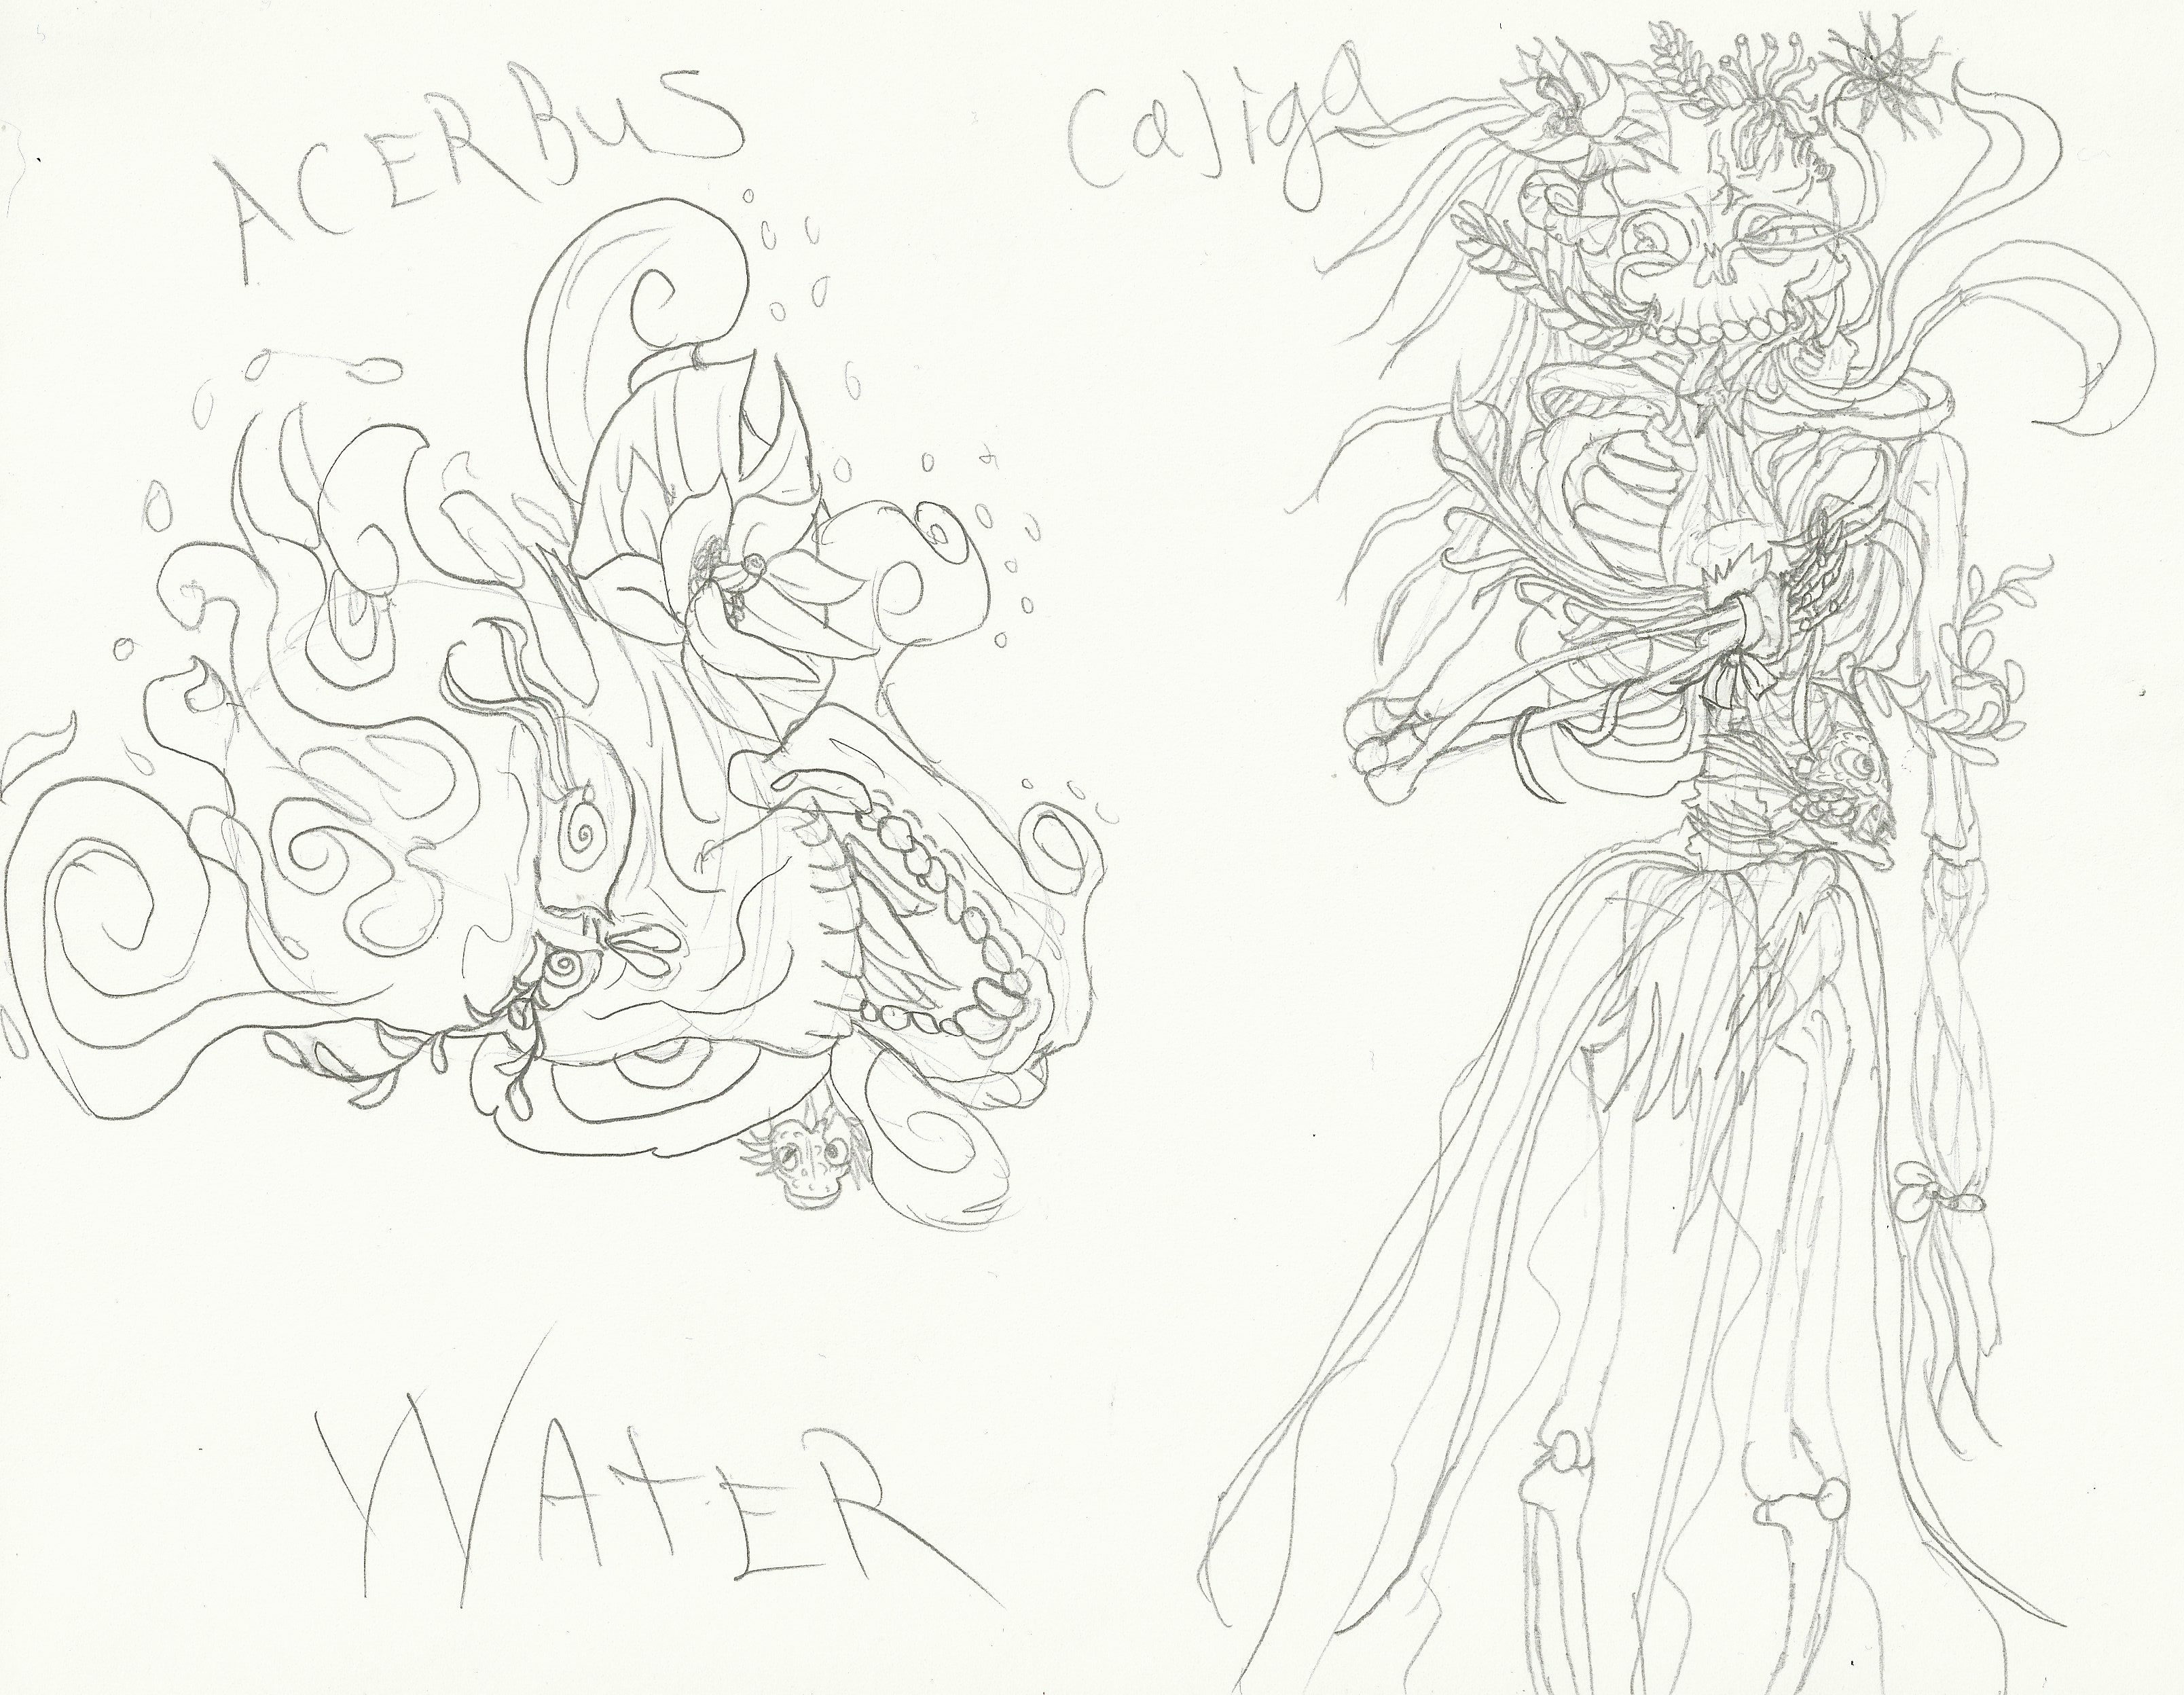 Water Acerbus & Caliga